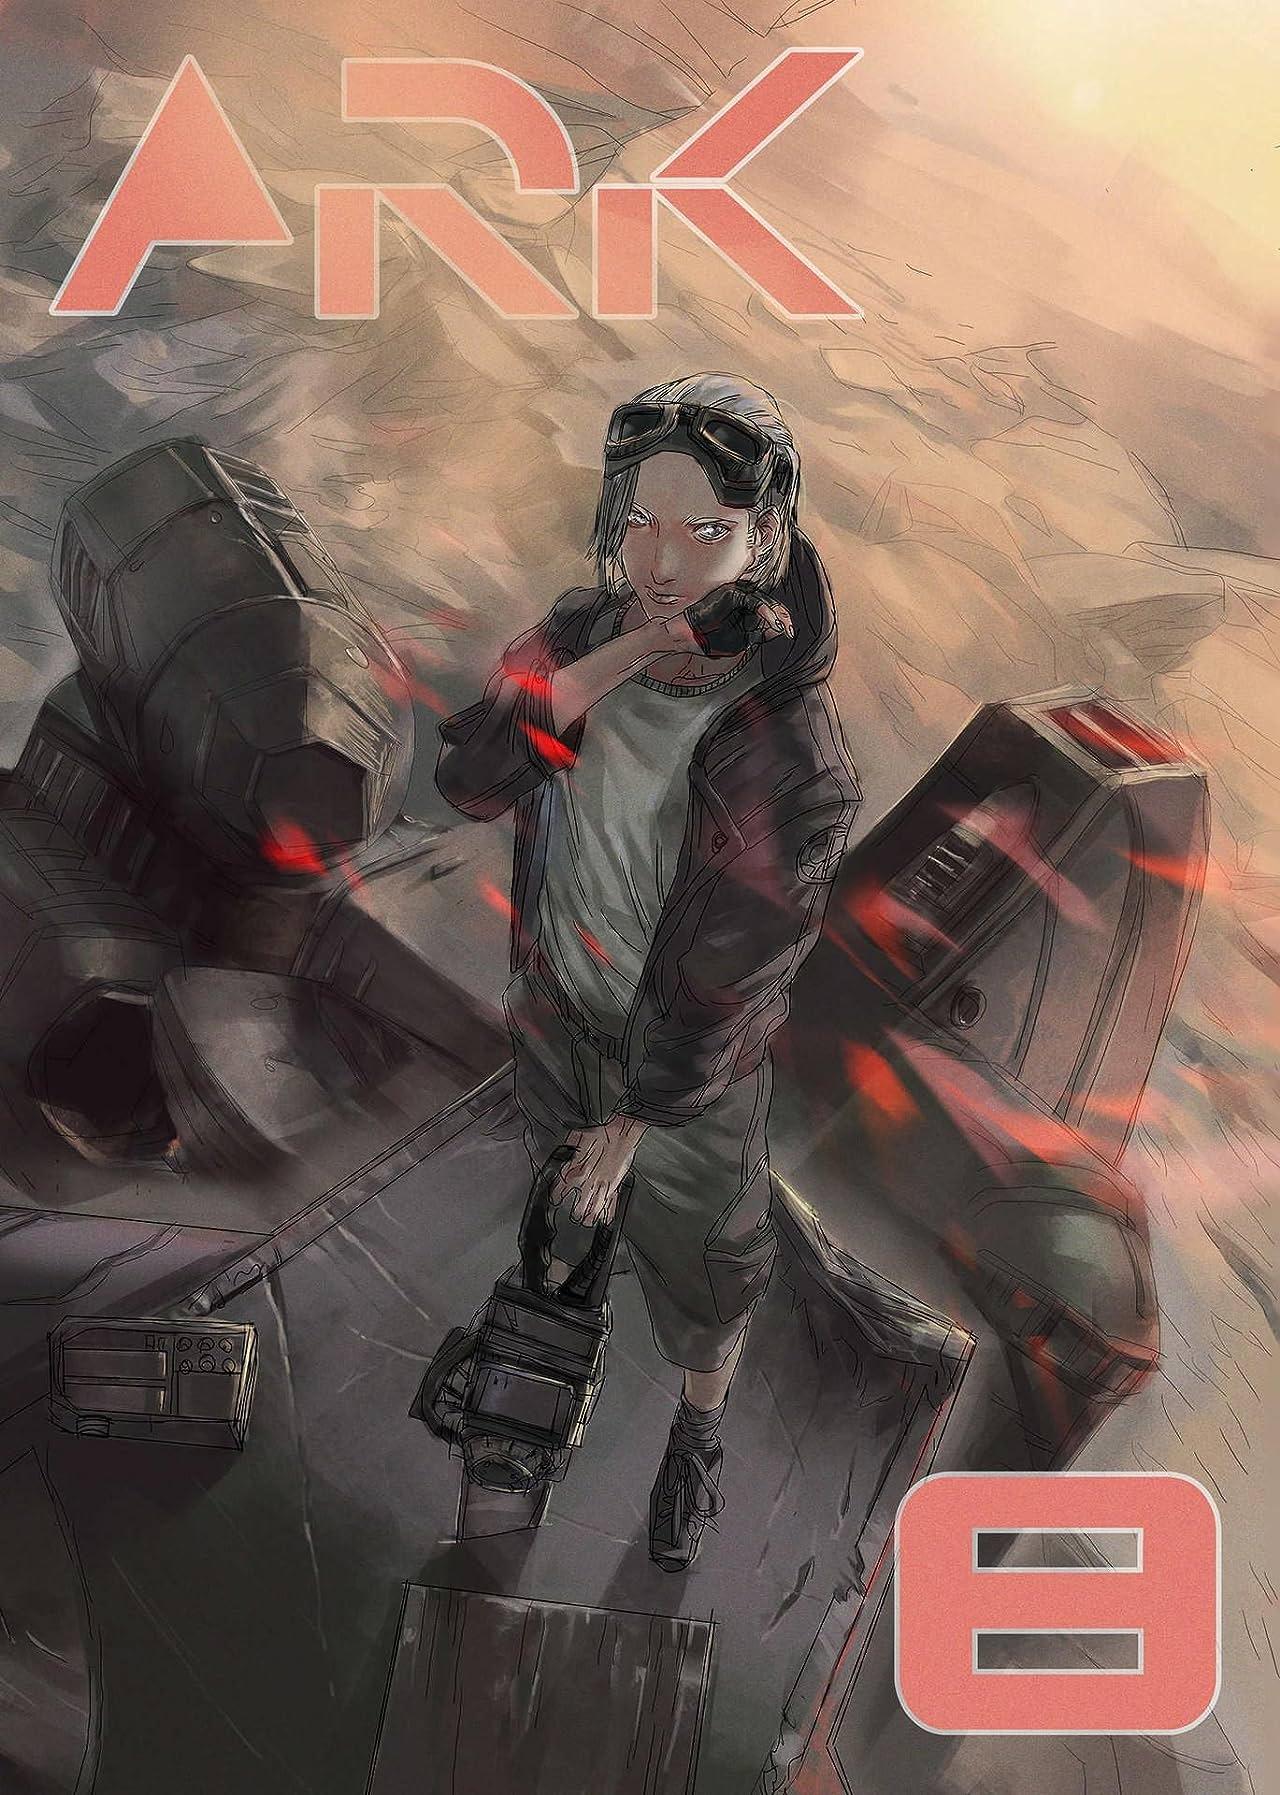 ARK #8